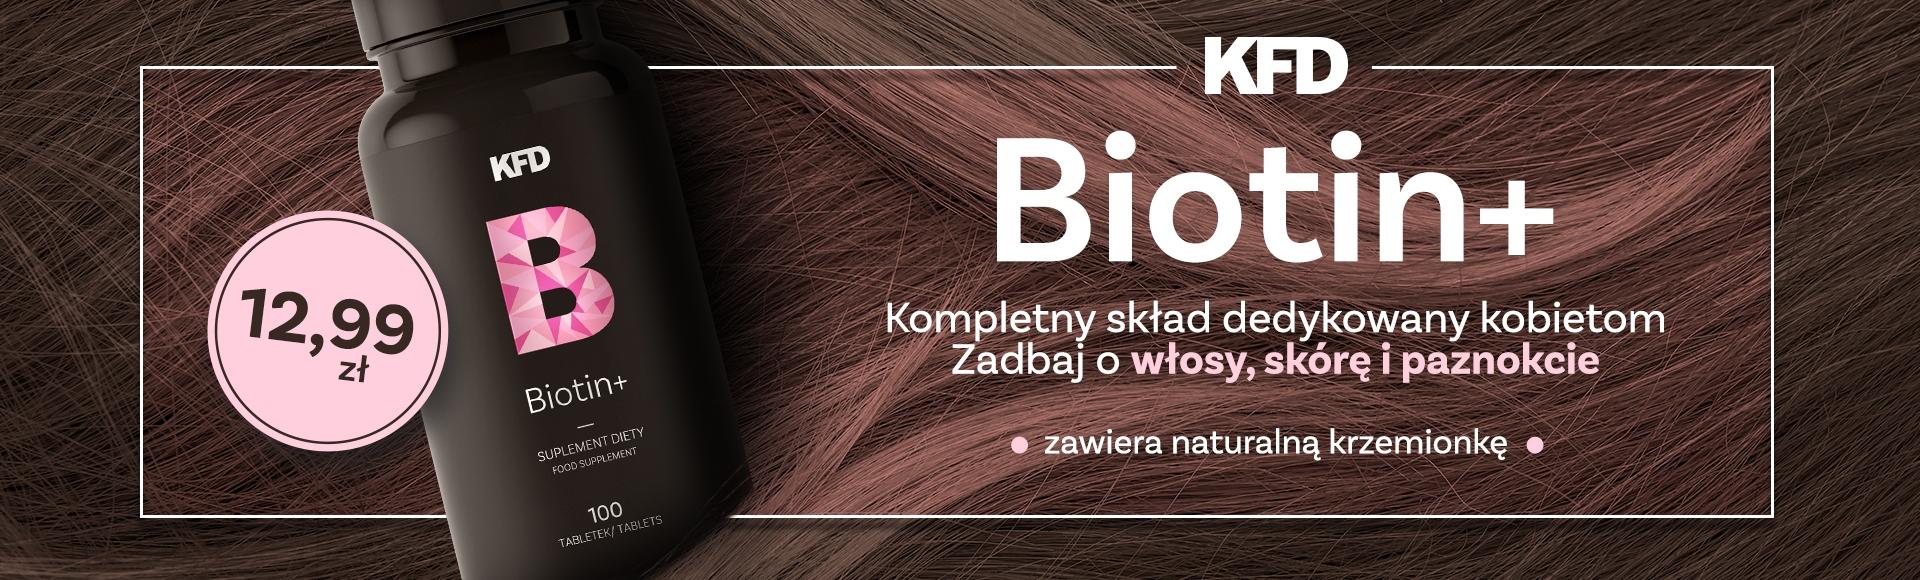 KFD Biotin+